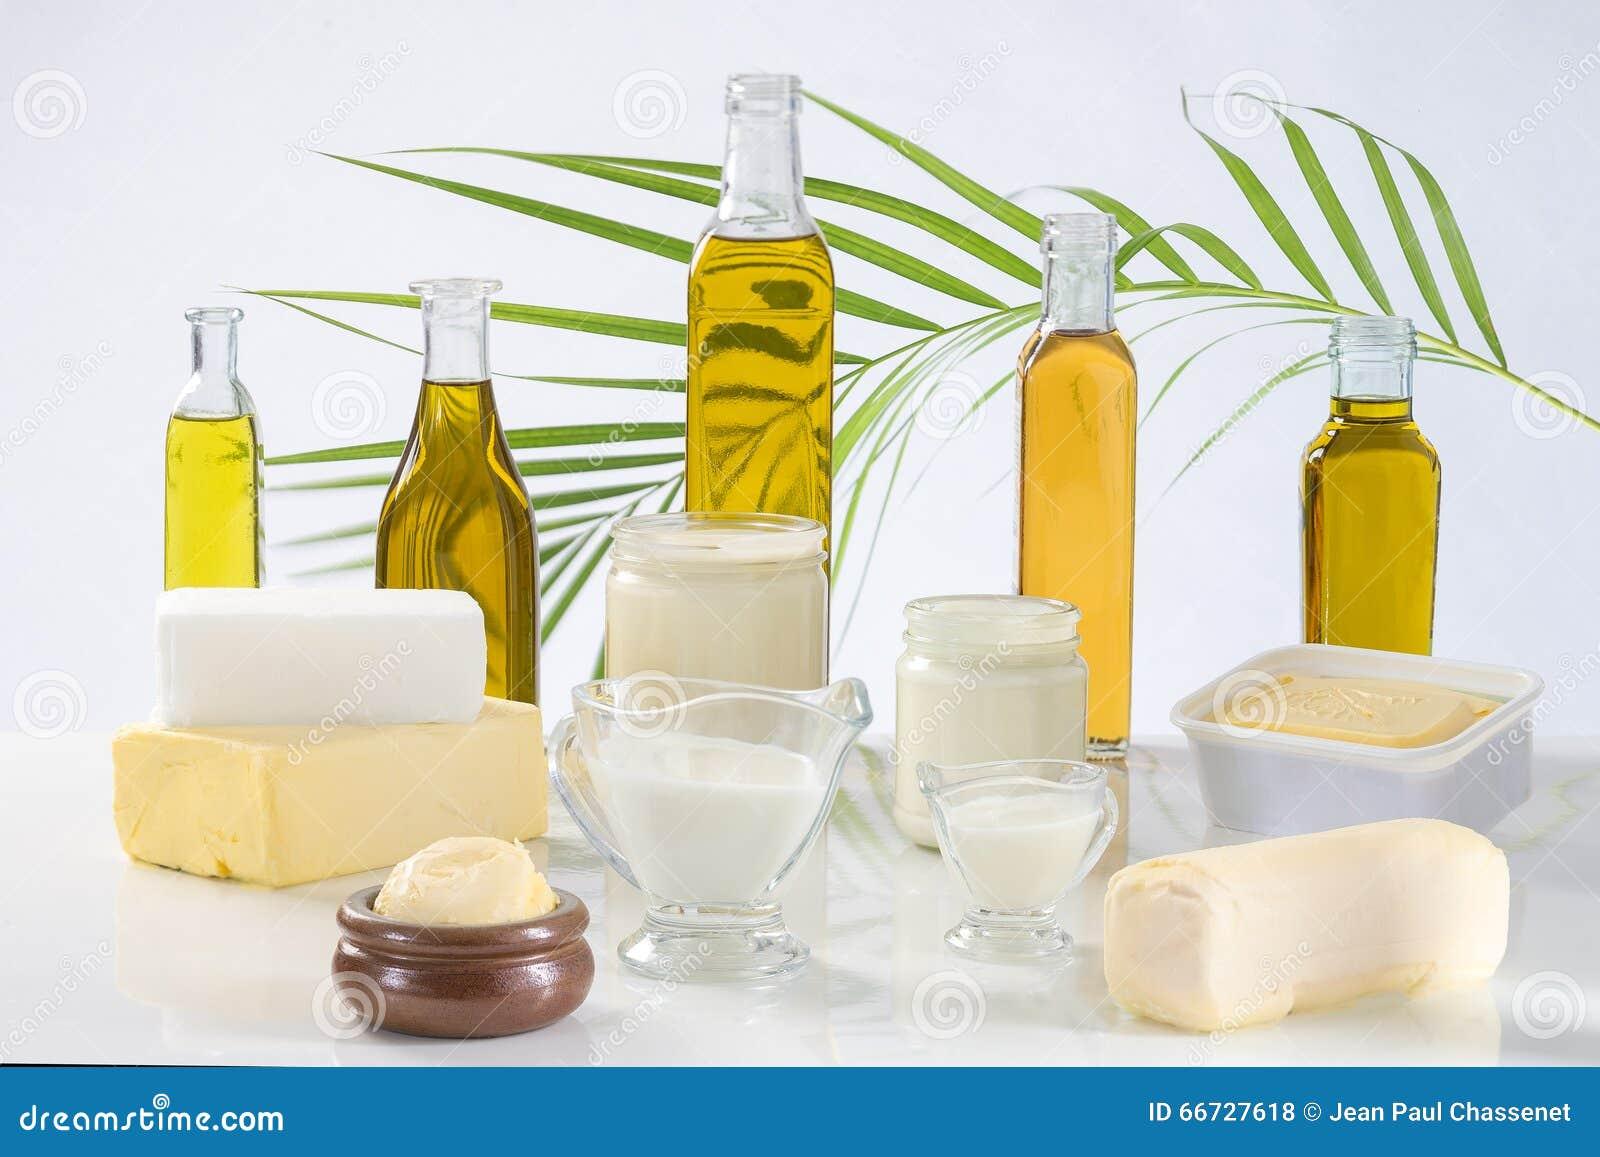 Culinary variety of fats